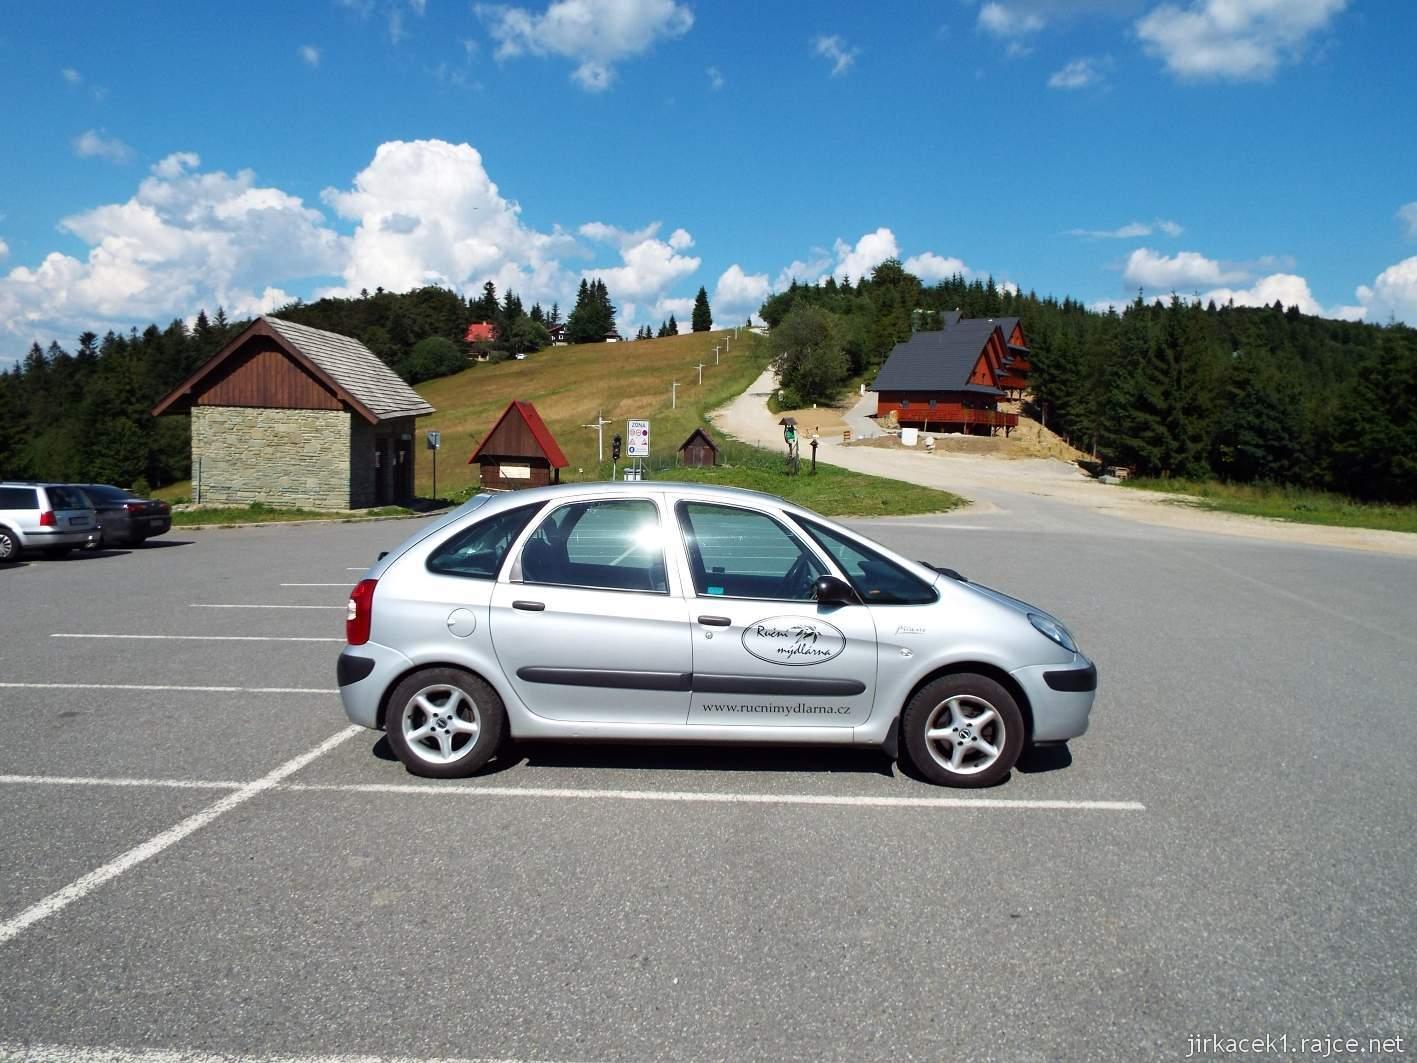 Horský hotel Portáš - naše auto na parkovišti